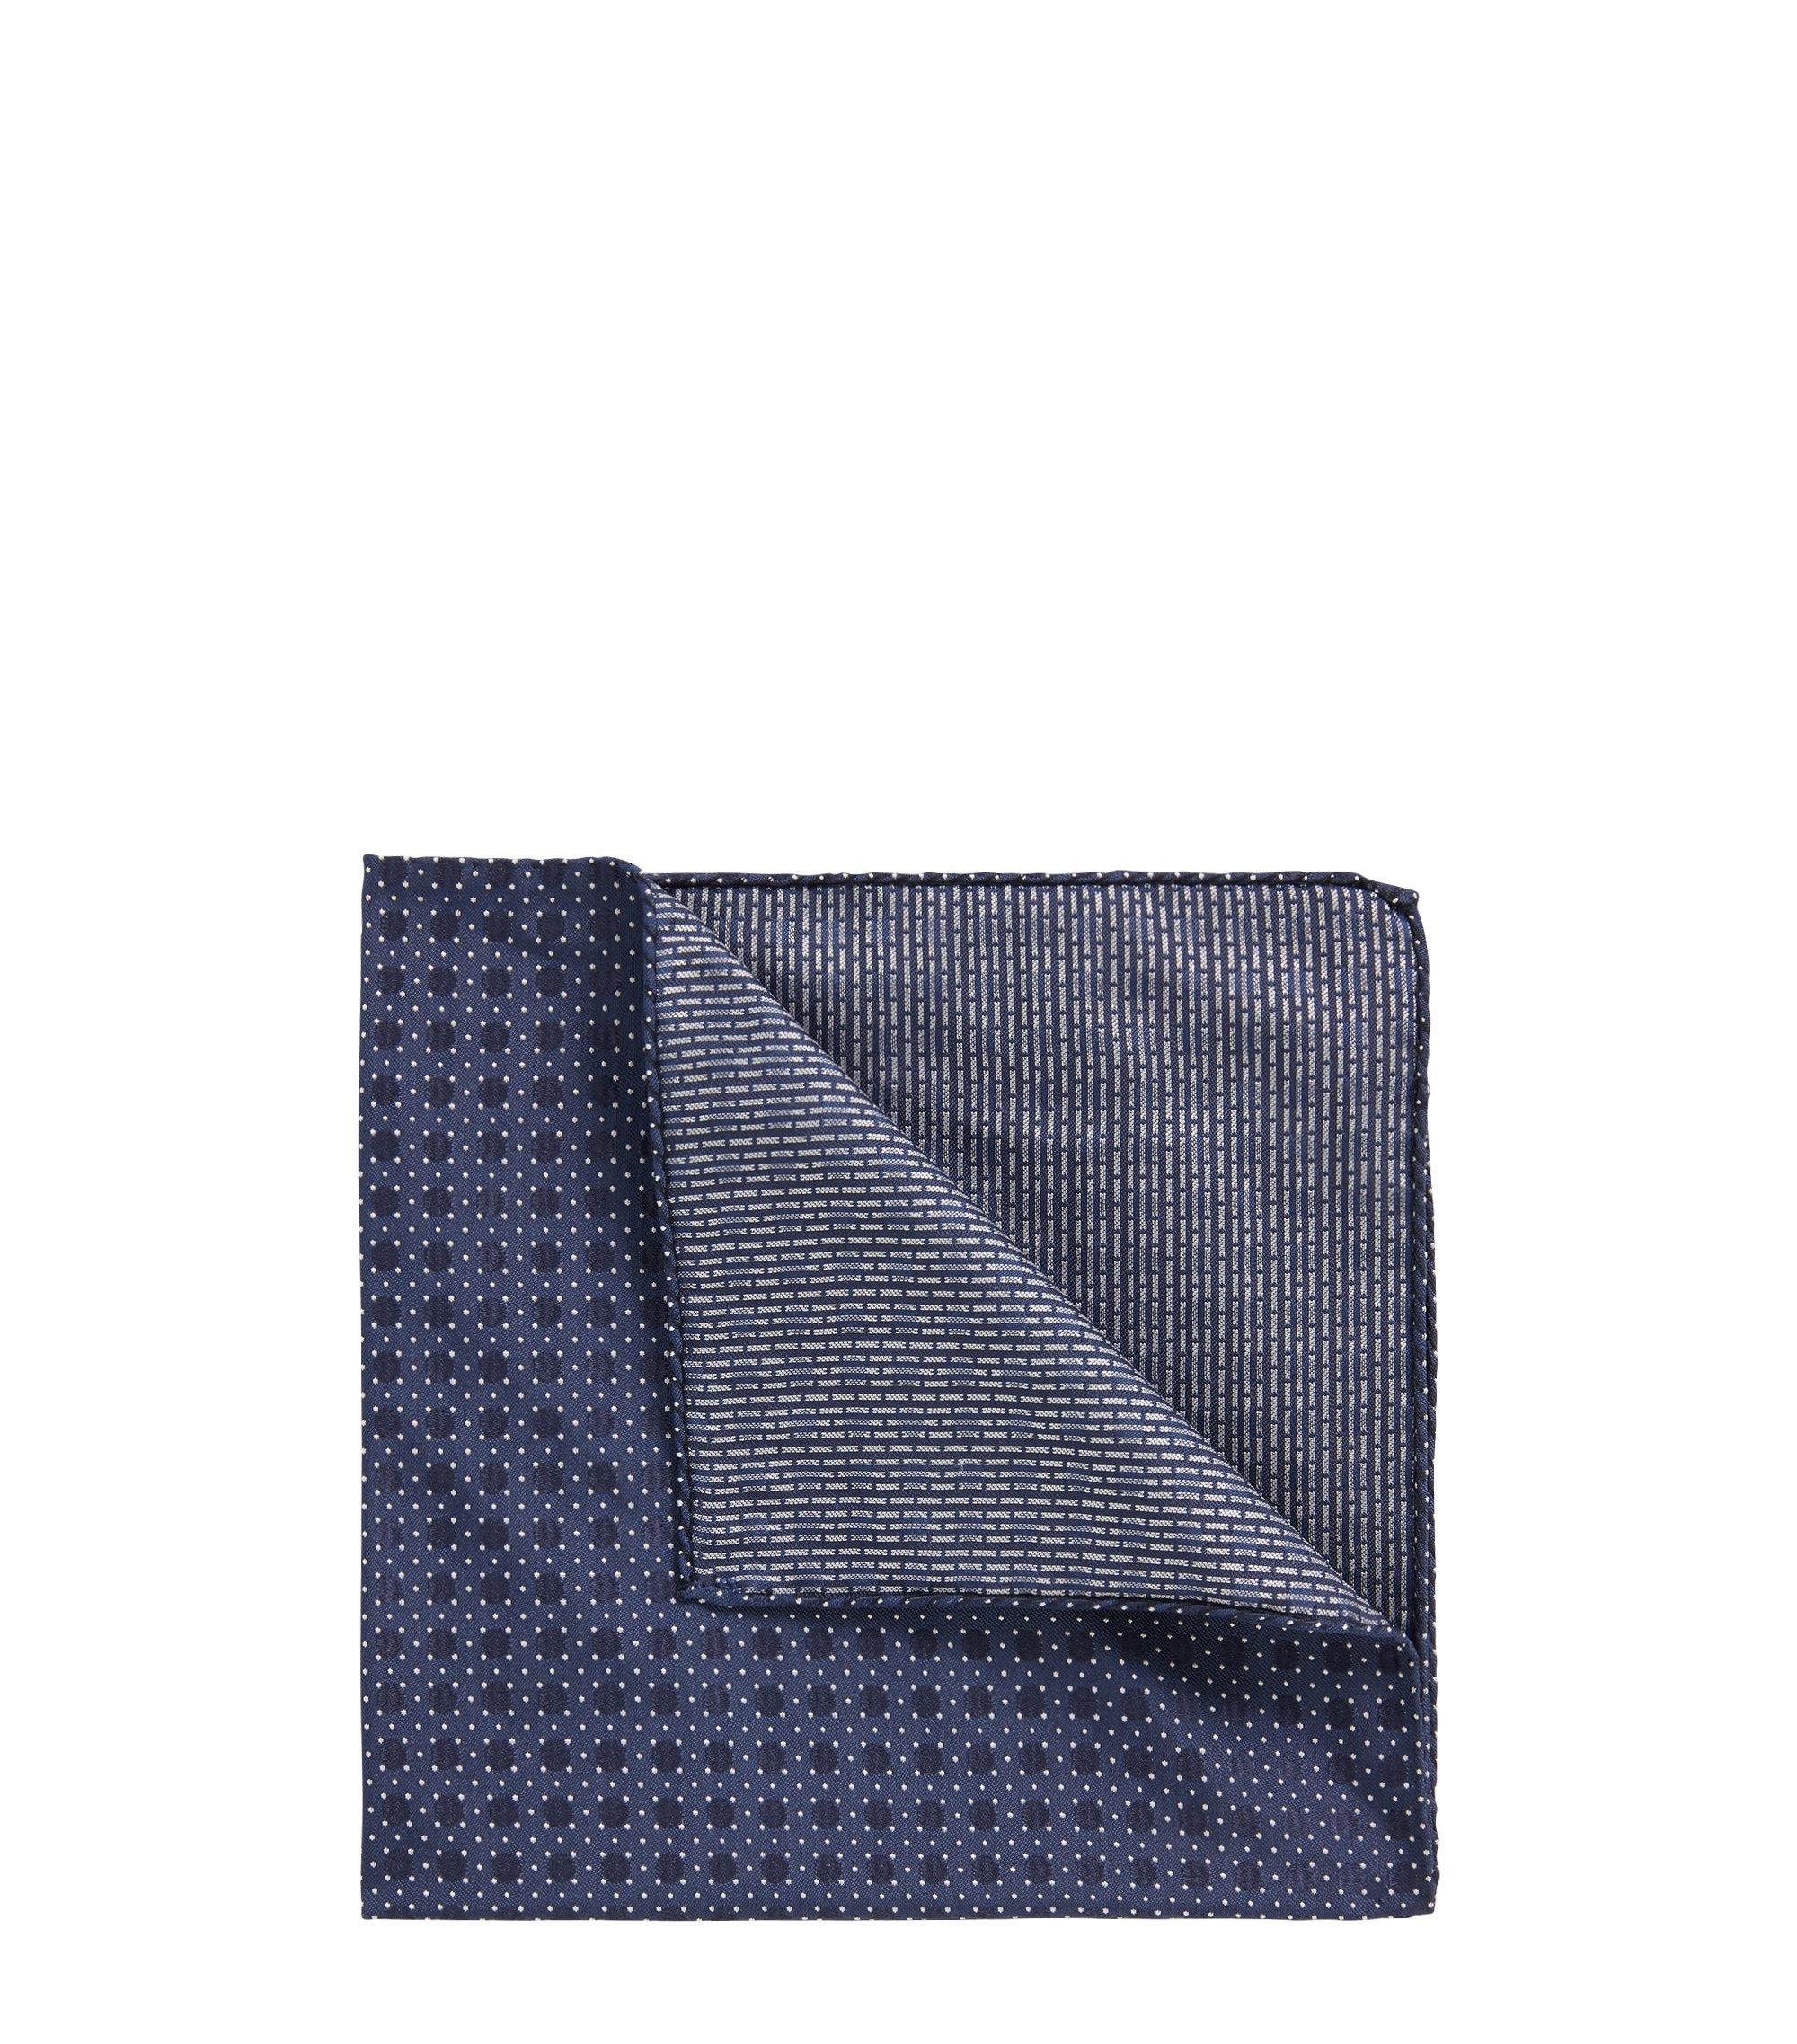 Pañuelo de bolsillo estampado en jacquard de seda de fabricación italiana, Azul